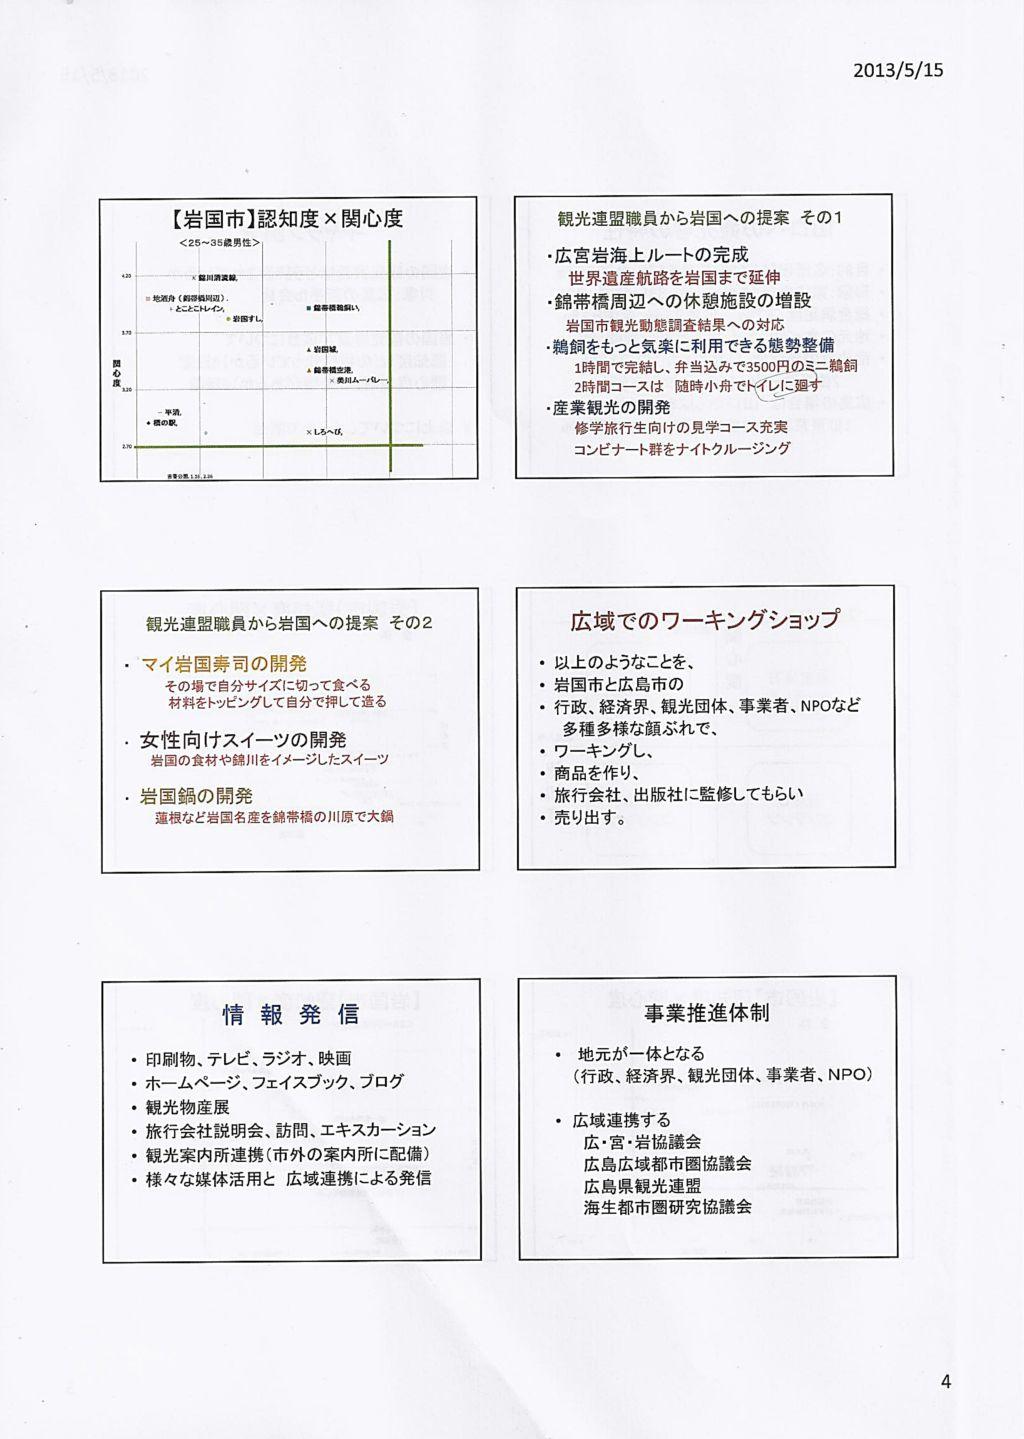 Scan_20130515_13_R.jpg